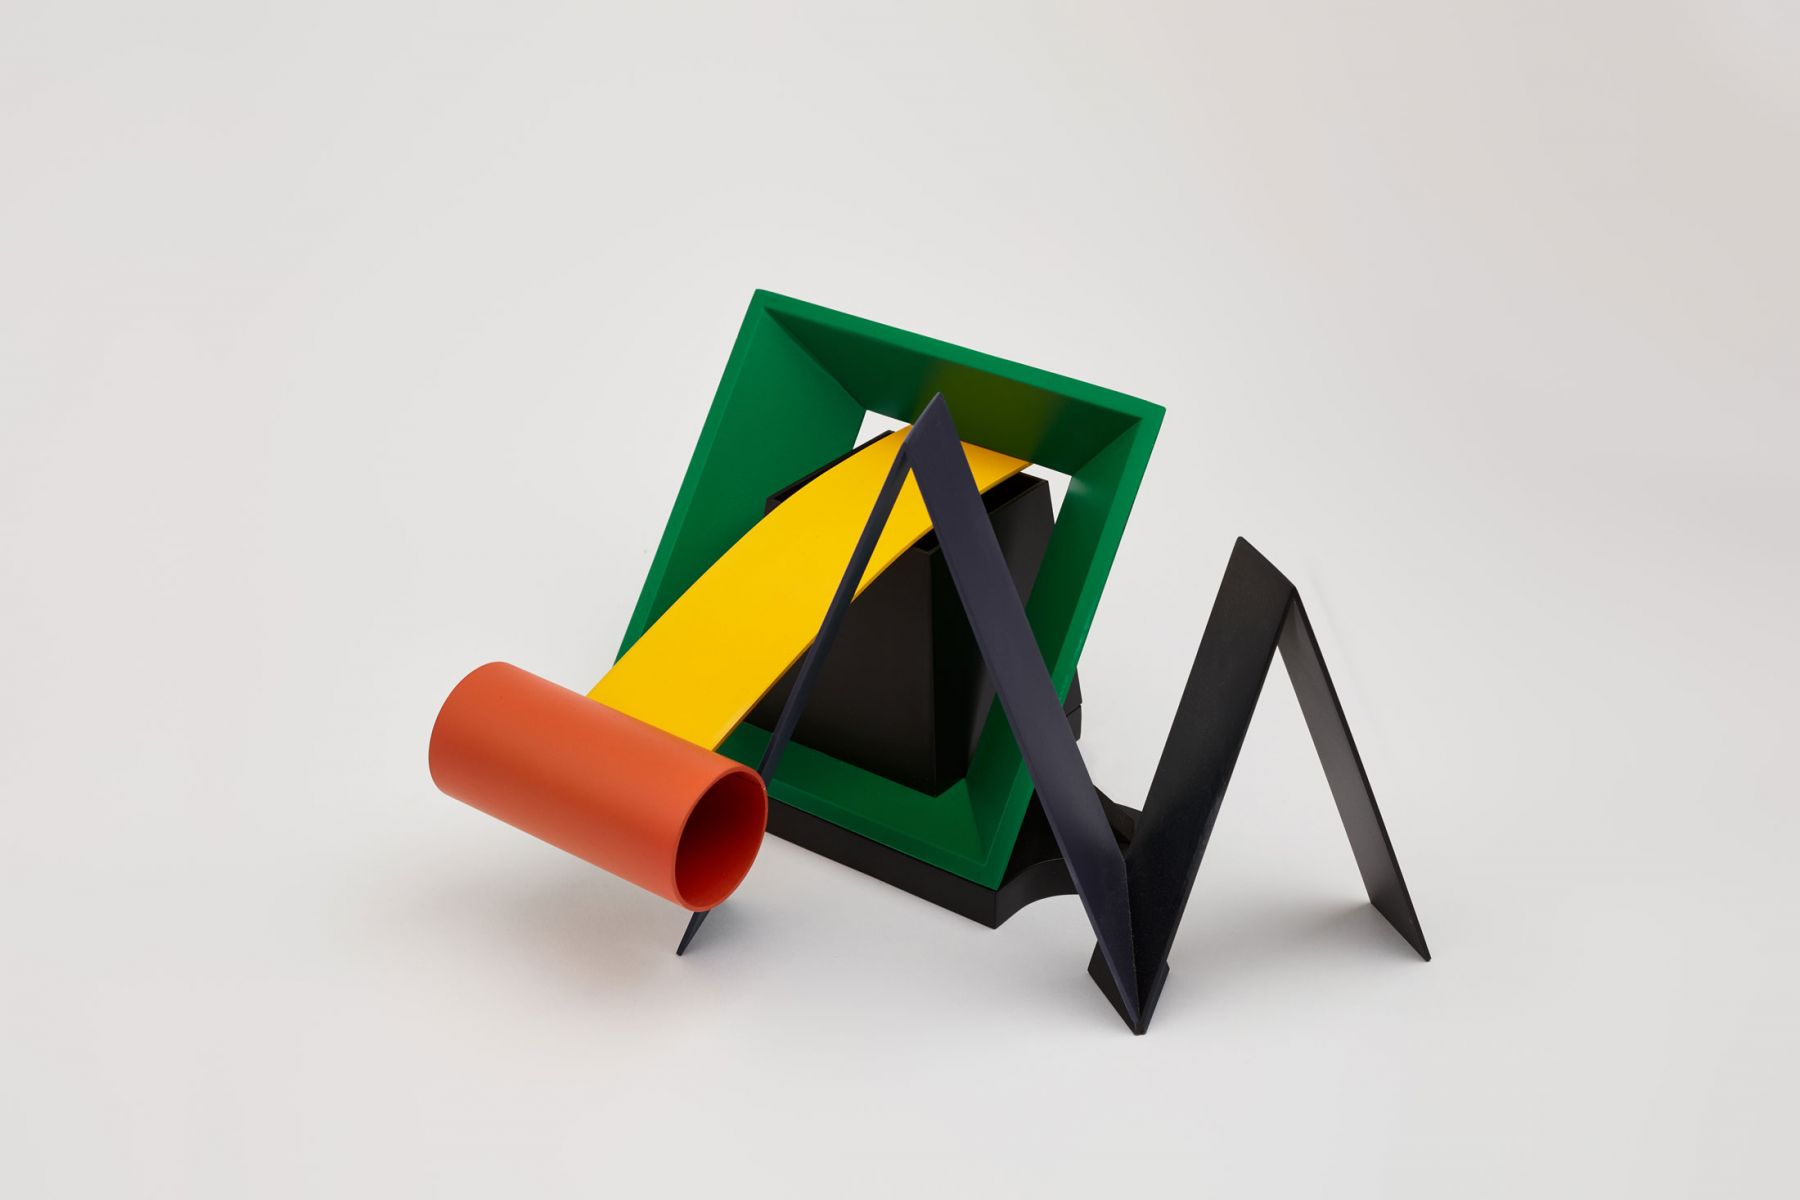 Phillip King, Lash (maquette), 2013